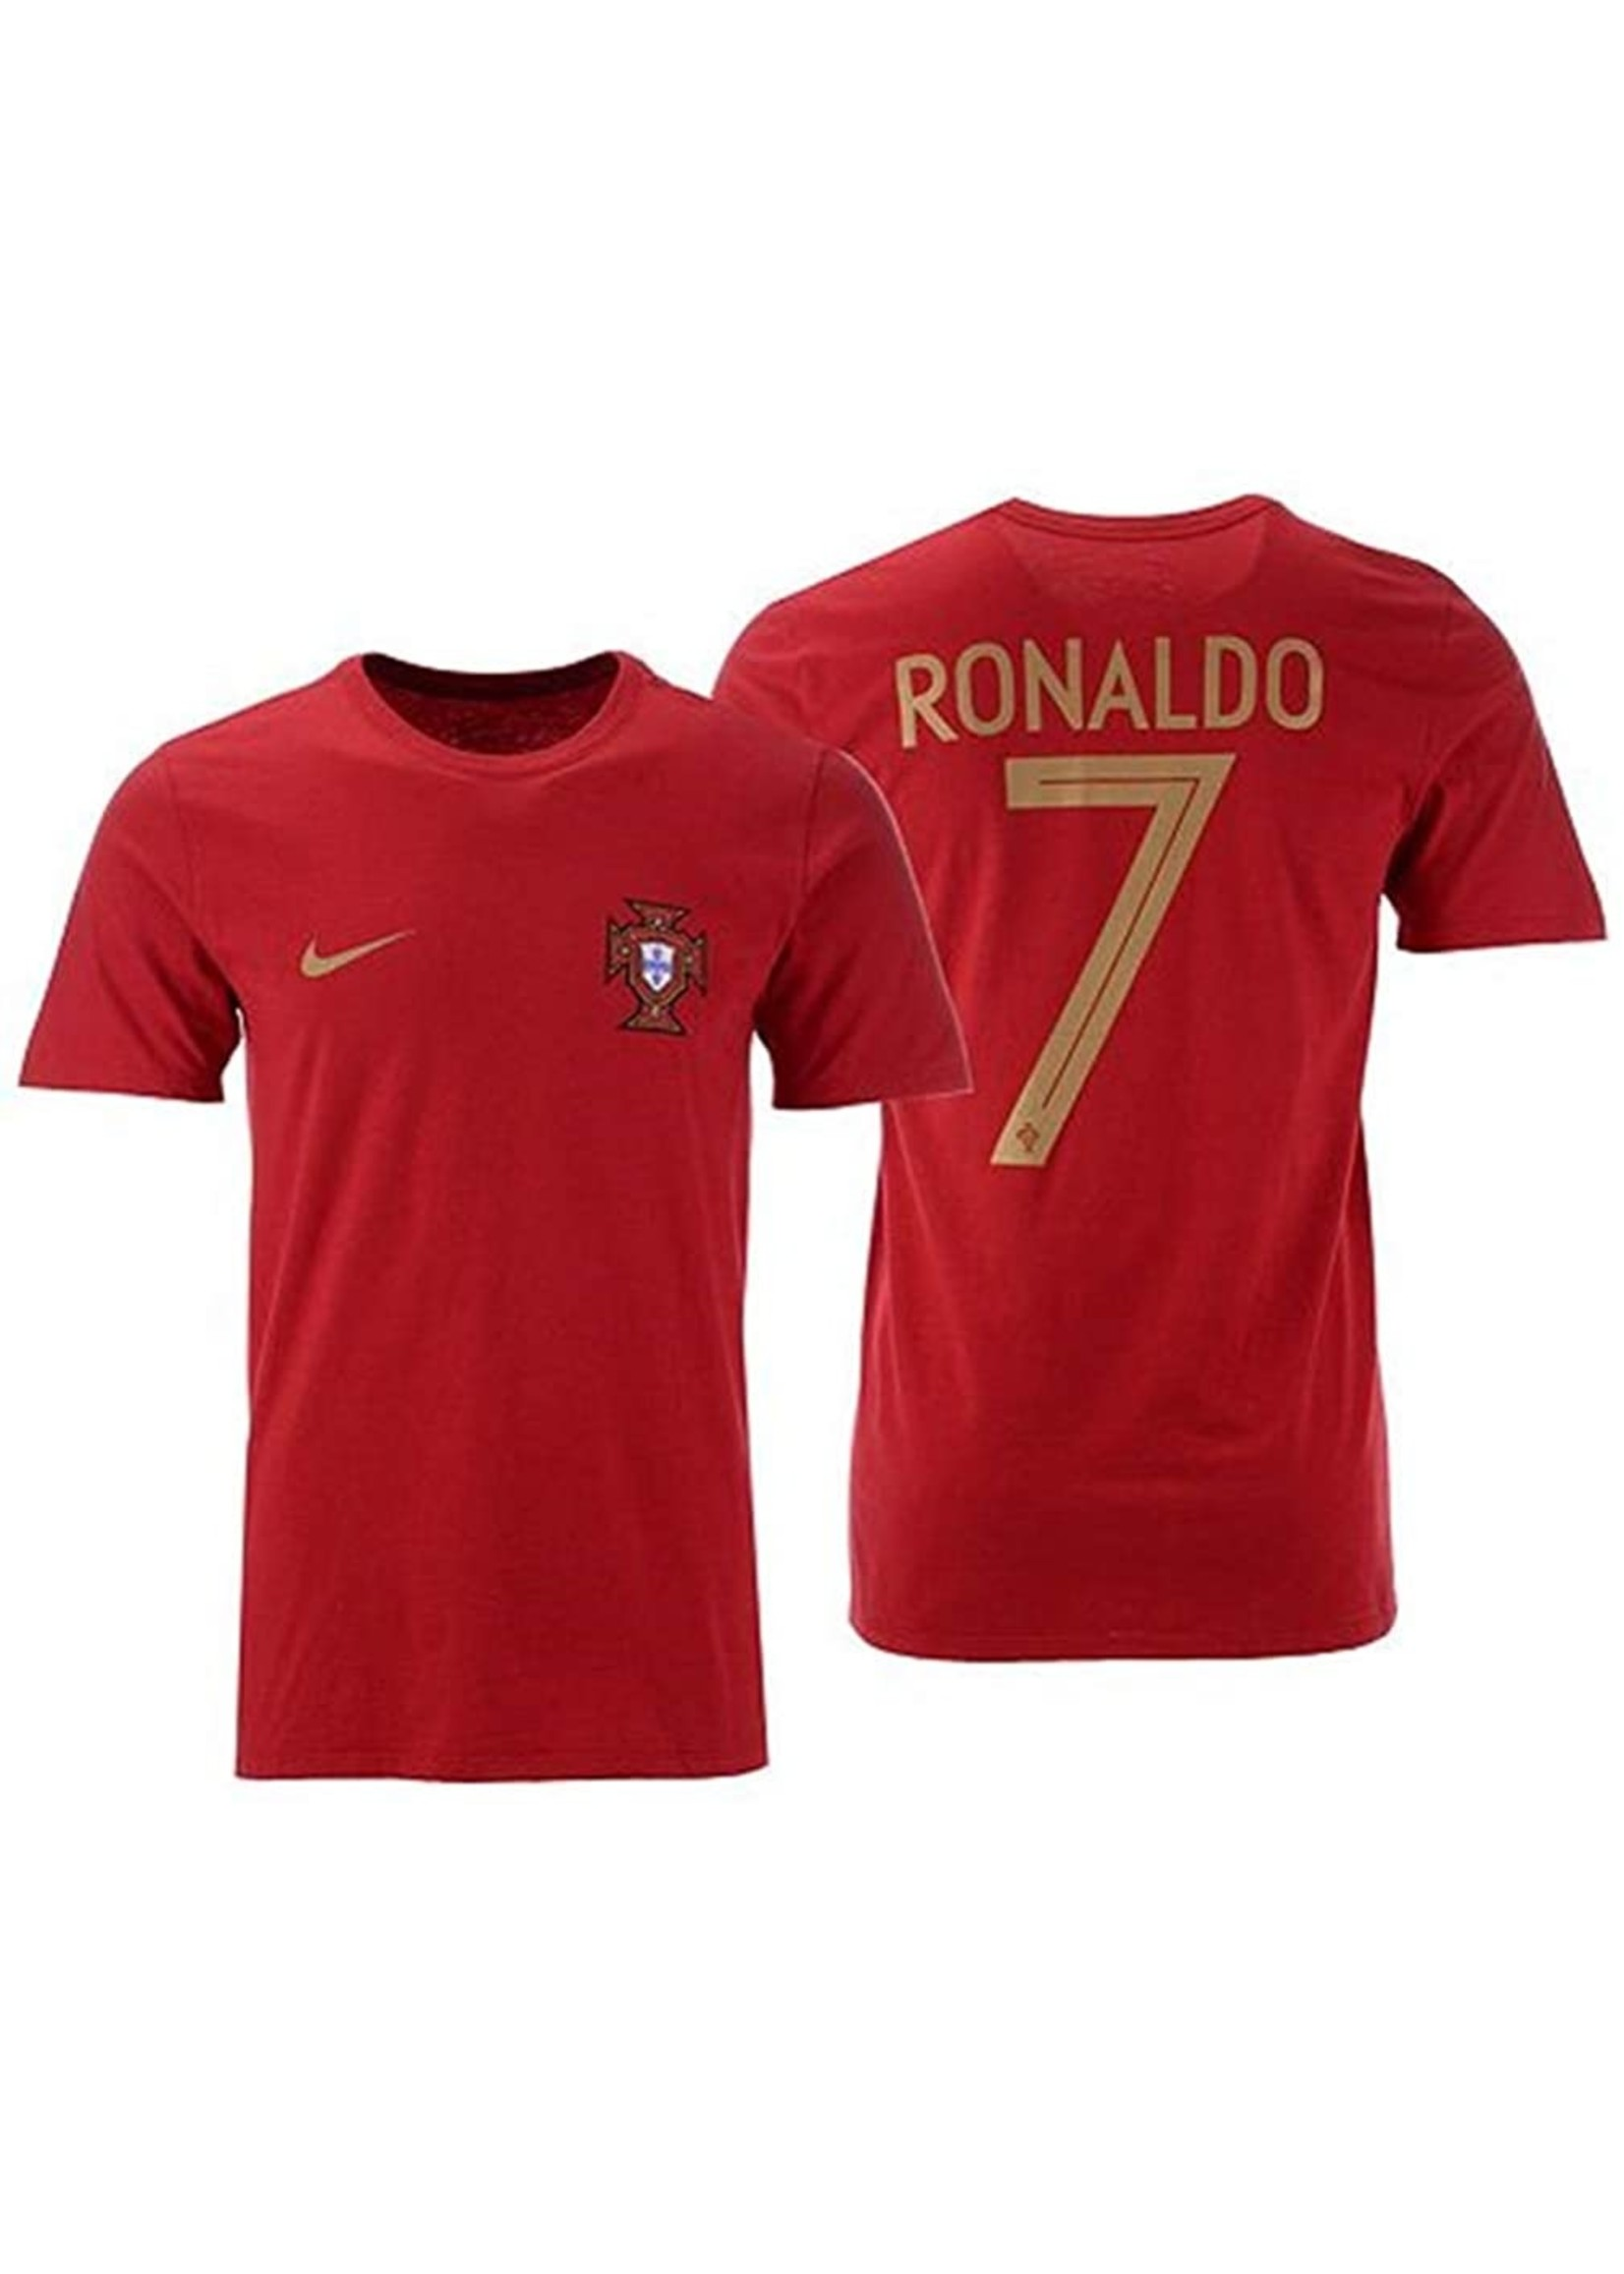 Nike RONALDO PORTUGAL T-SHIRT